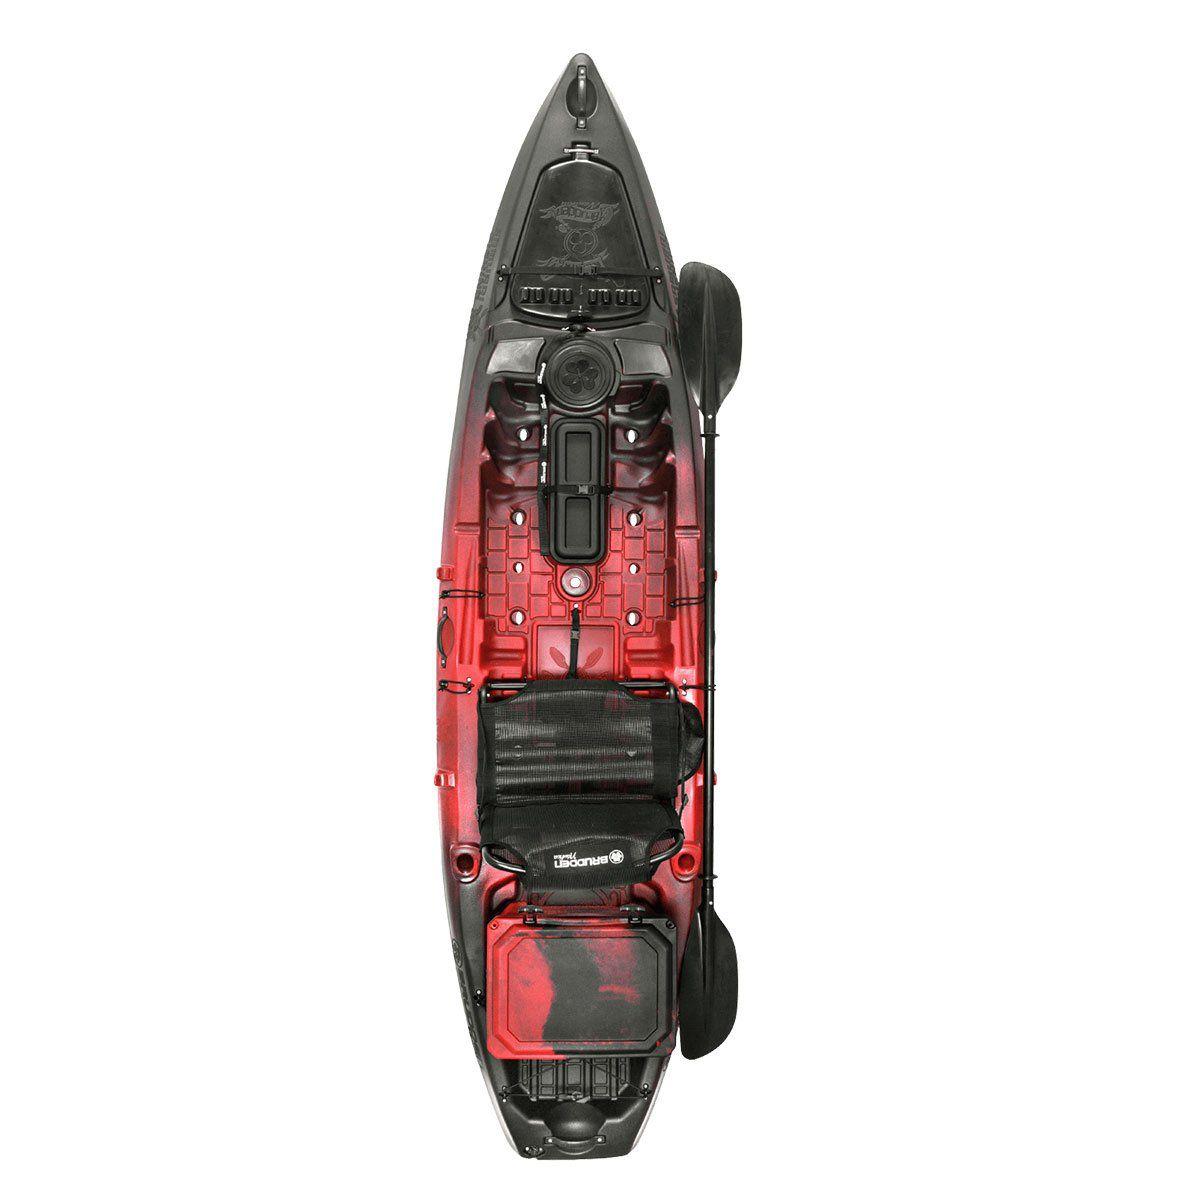 Caiaque Brudden Samurai FishingPro Vermelho/Preto Cooler 30L